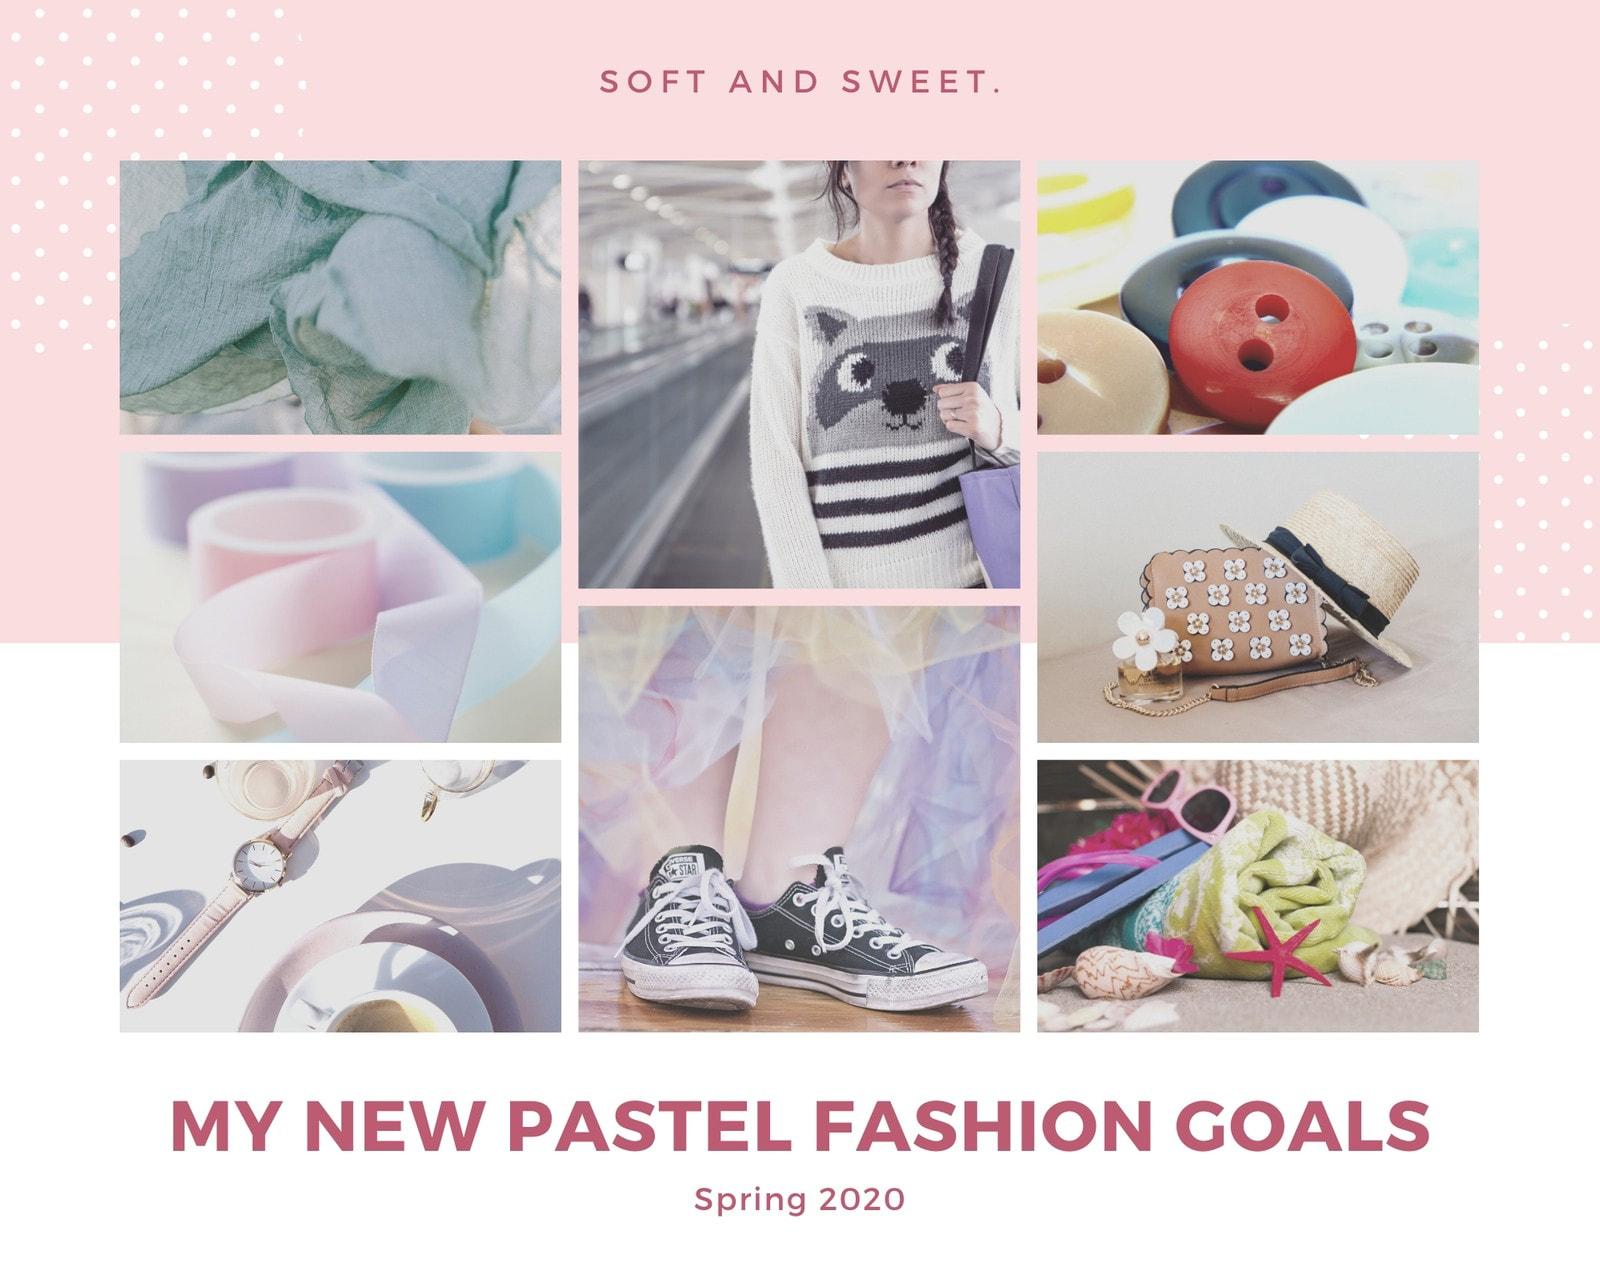 Pastel Fashion Photo Grid Mood Board Photo Collage